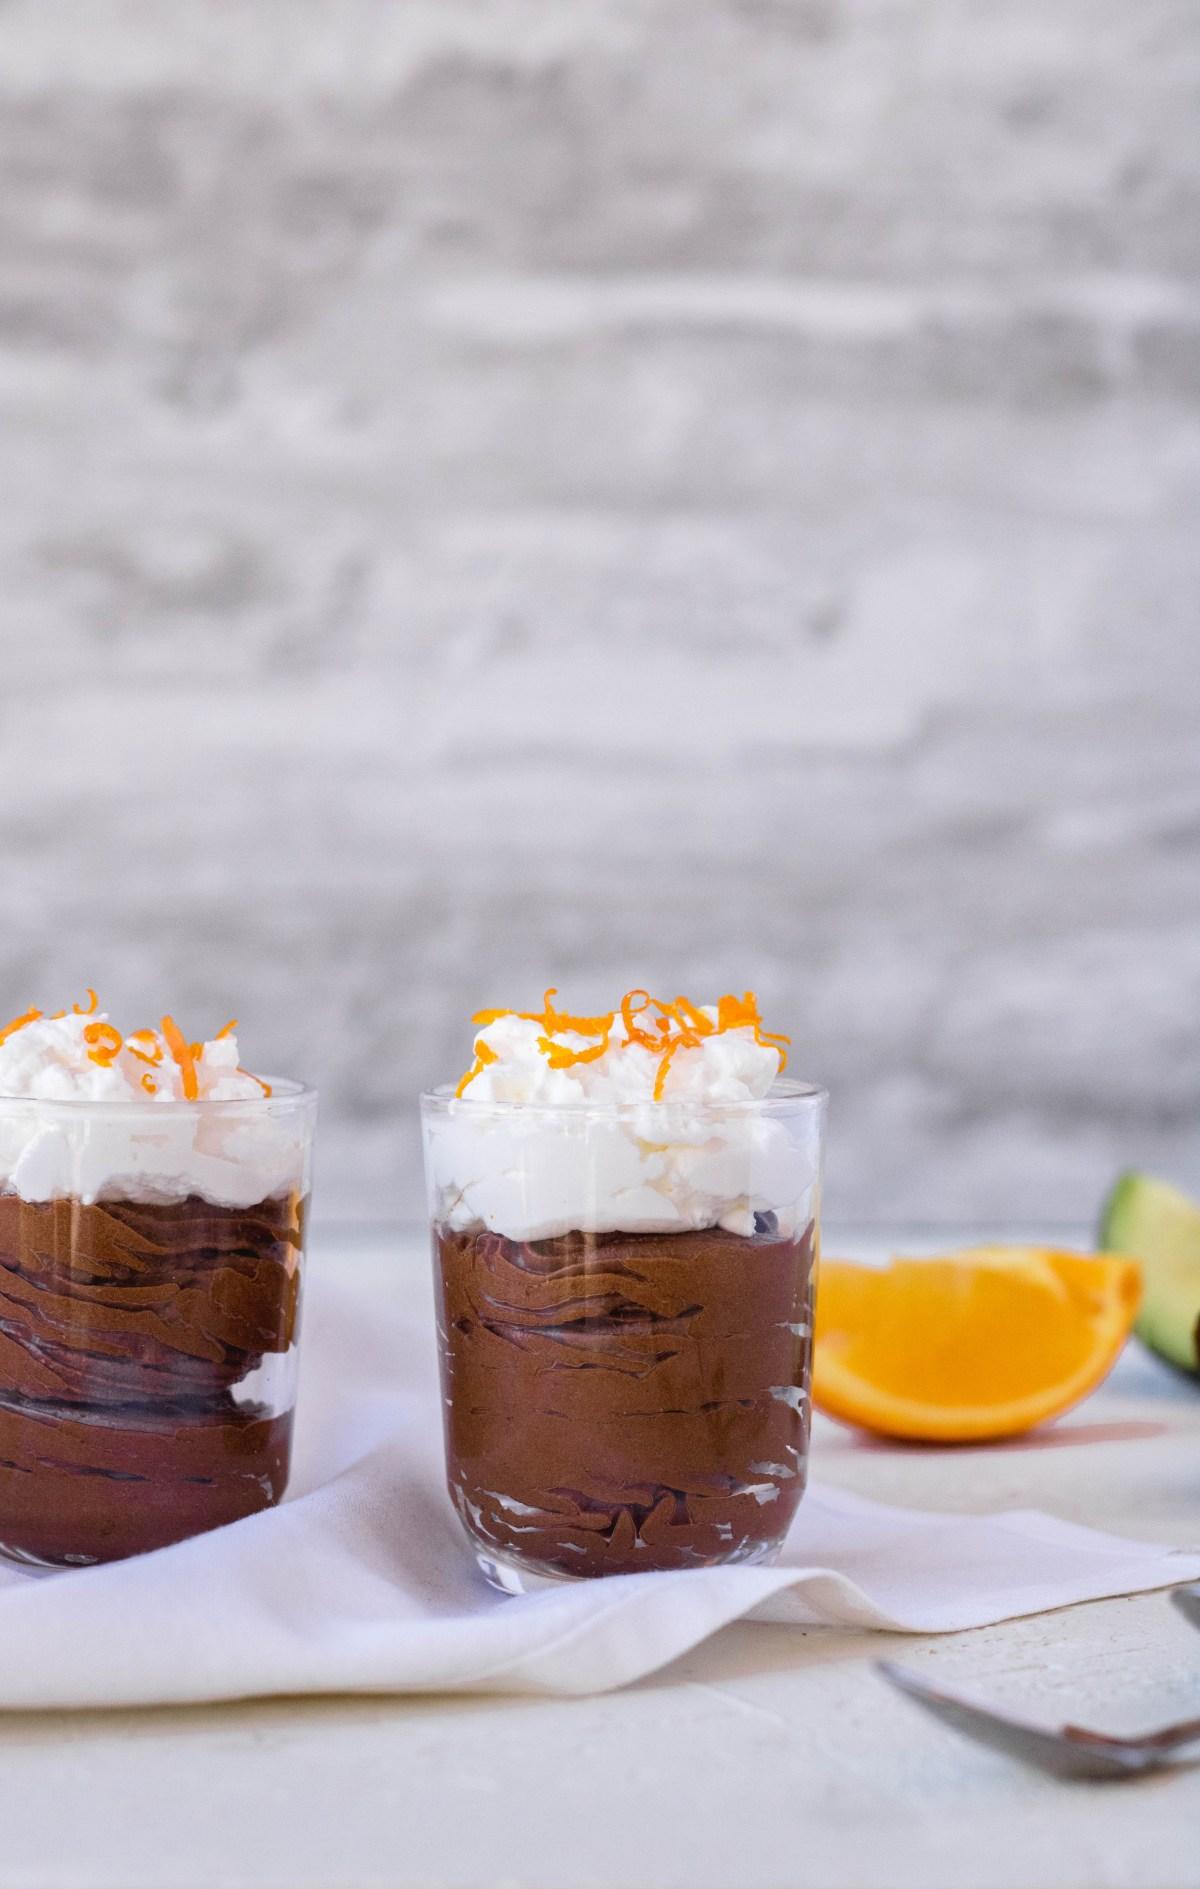 Vegan chocolate orange mousse for valentine's day